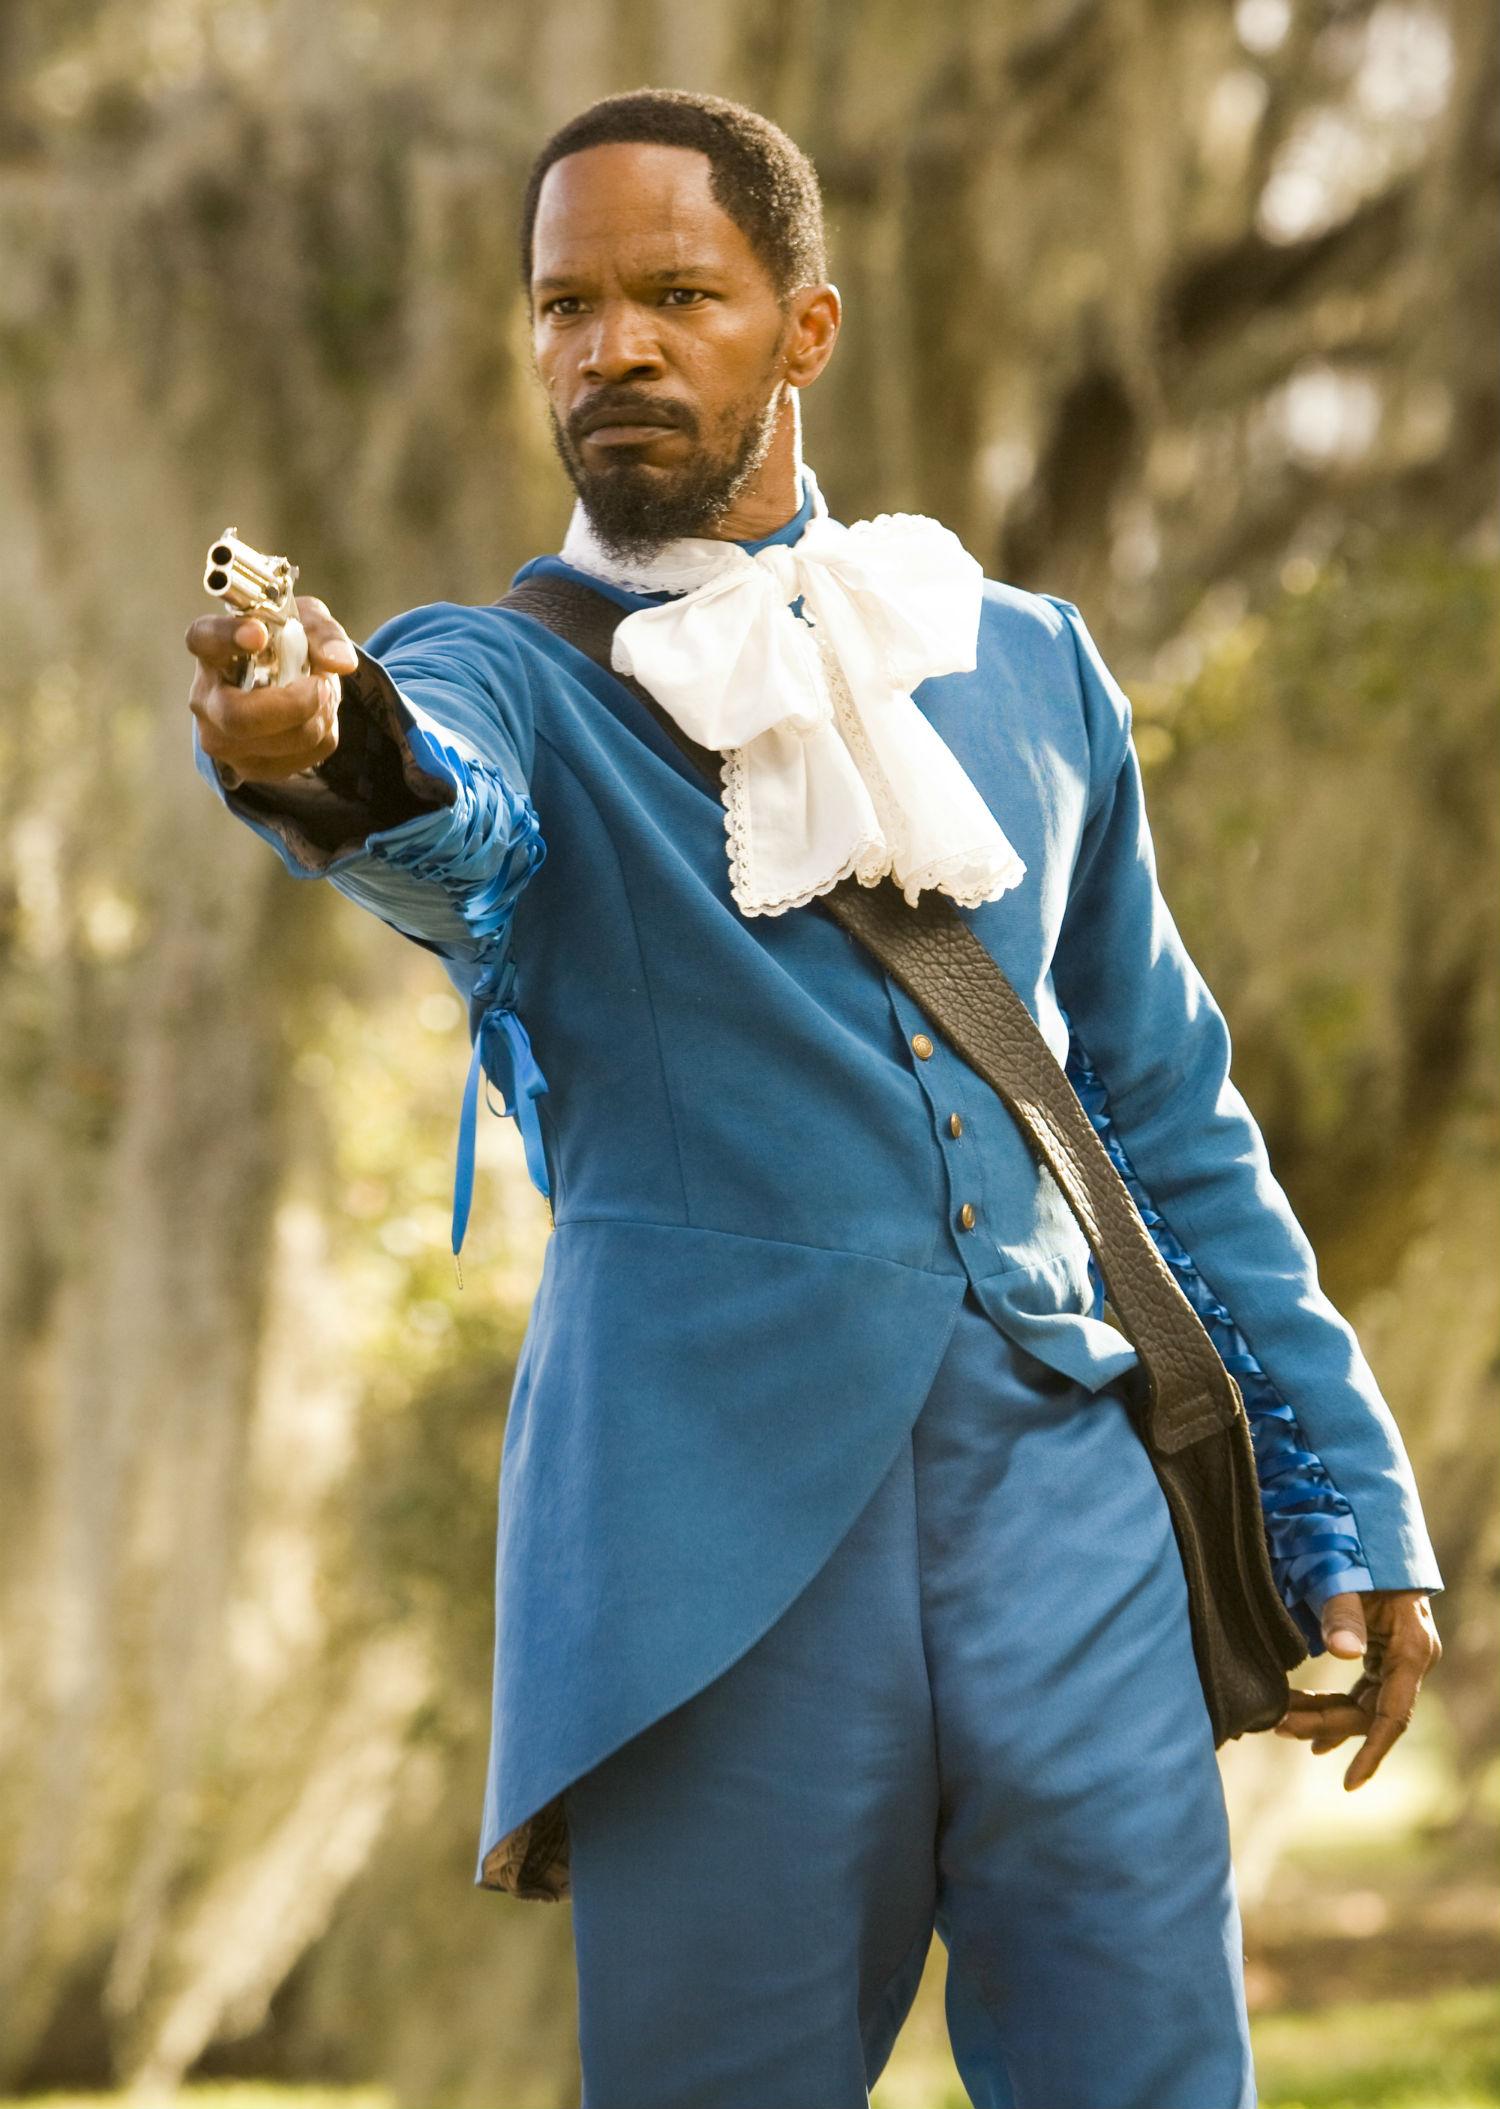 django unchained jamie foxx blue suit